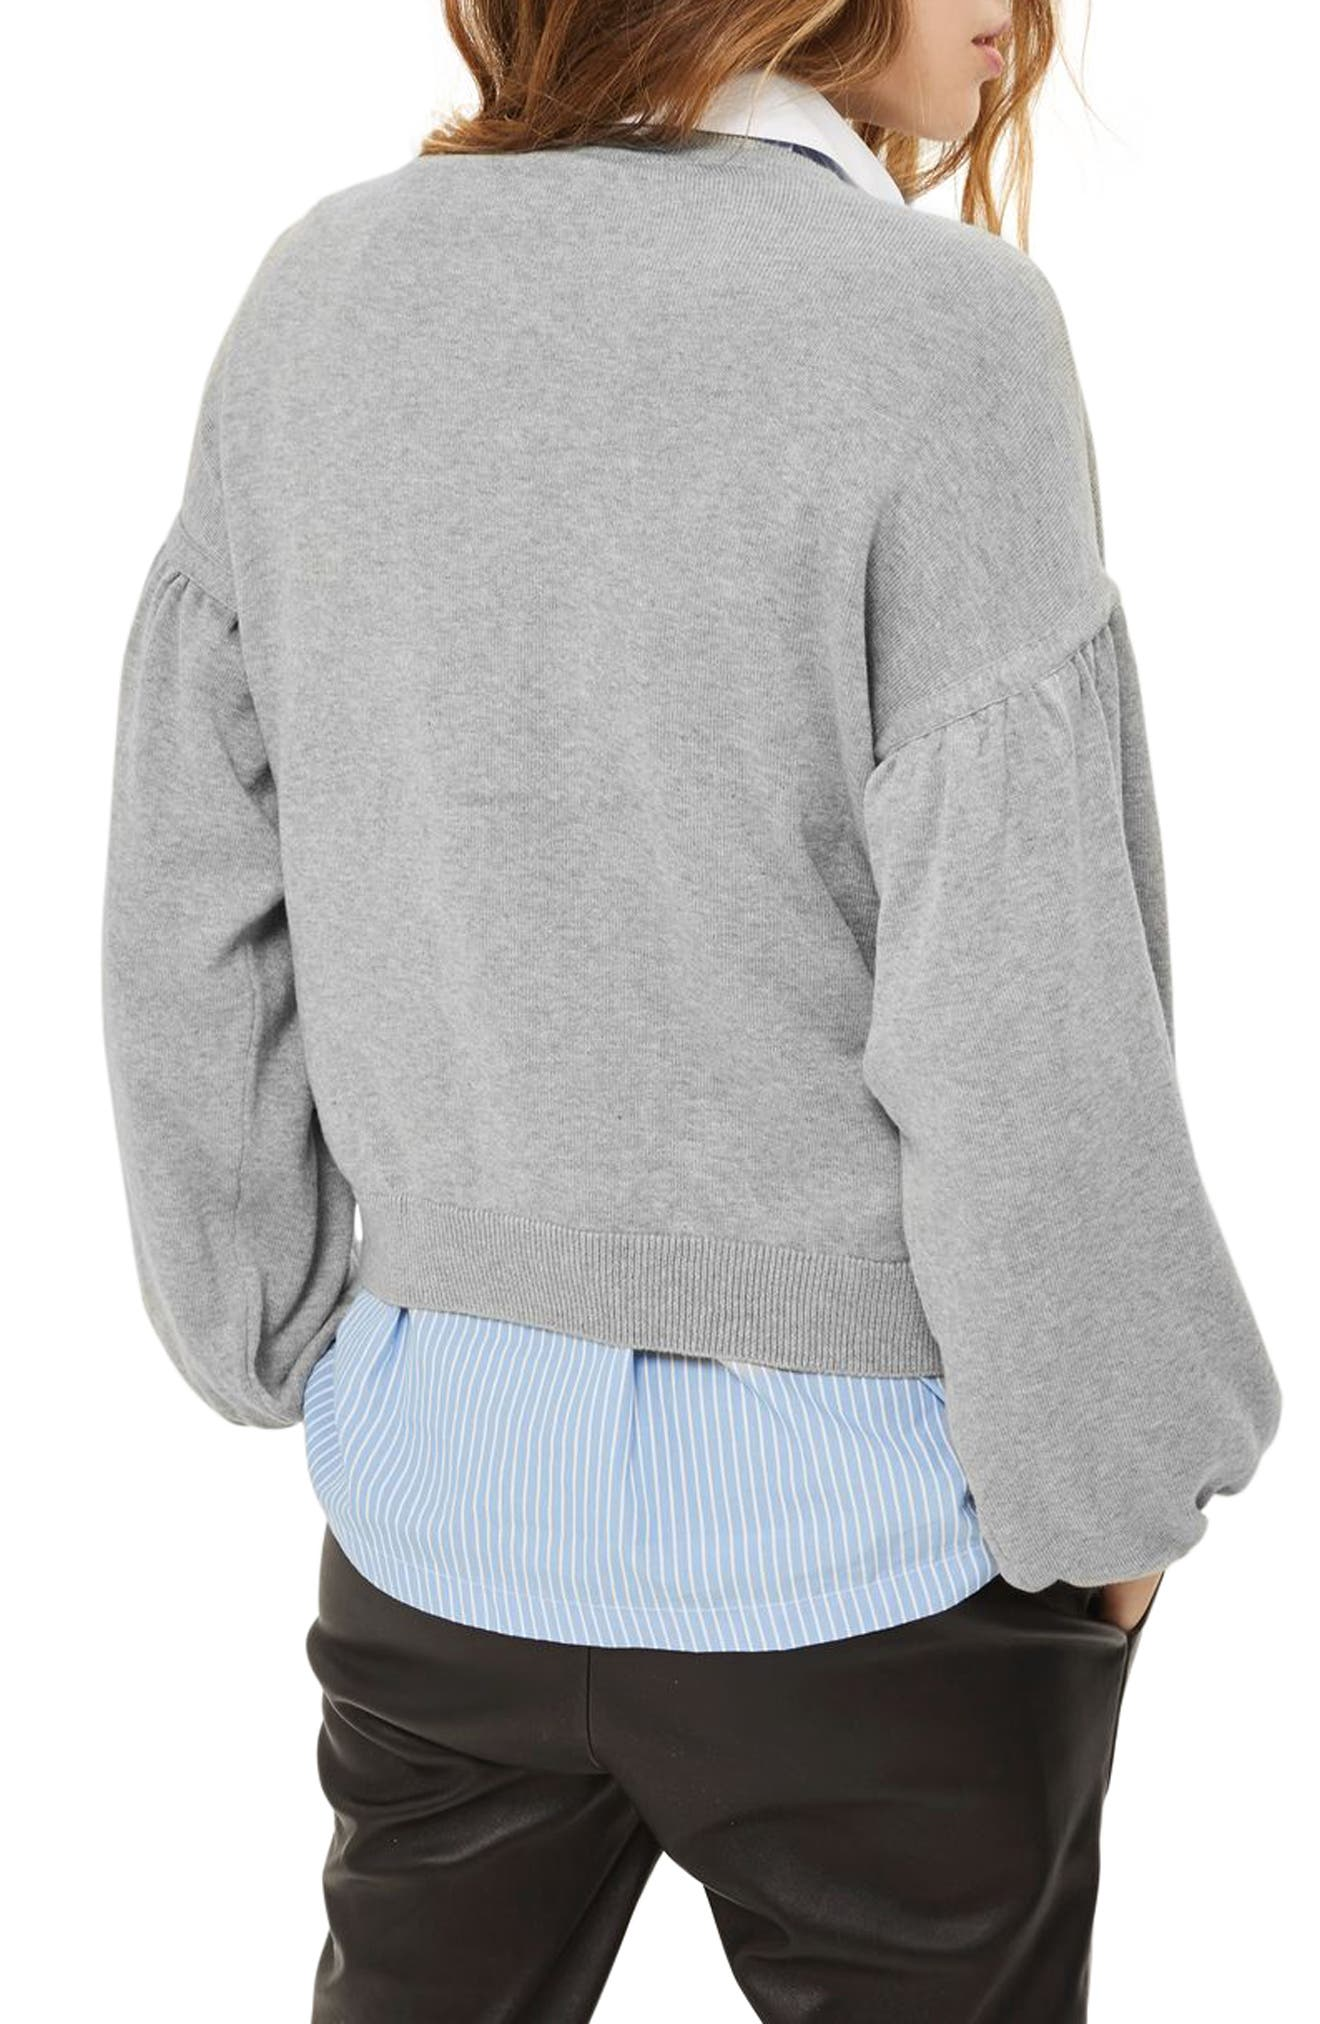 Beaded Balloon Sleeve Sweater,                             Alternate thumbnail 3, color,                             Grey Marl Multi